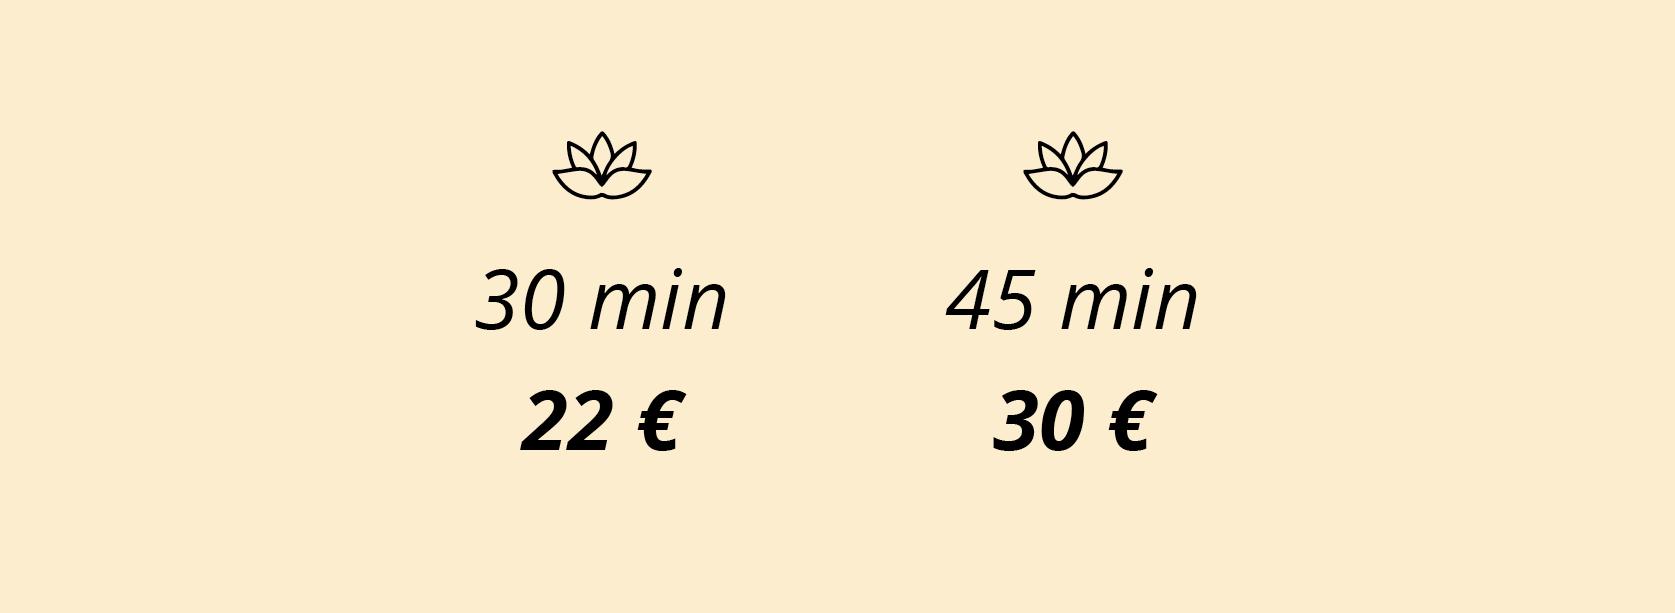 nebo antistress:jetlag price